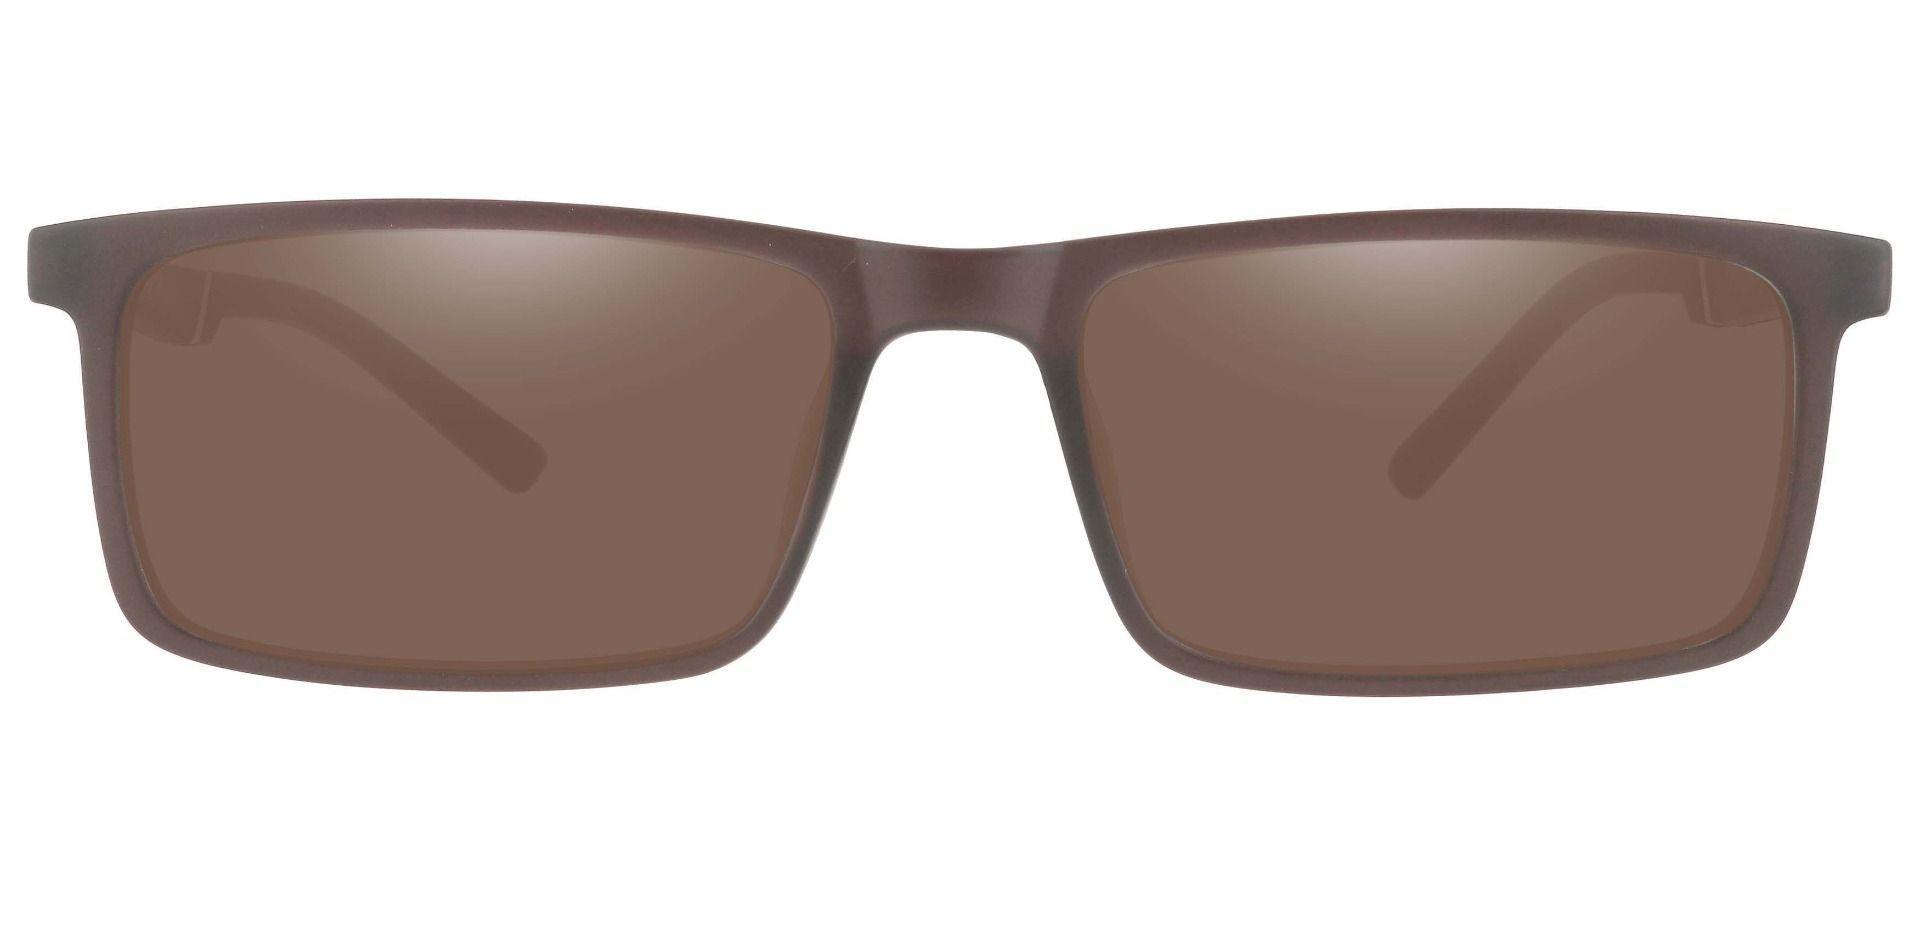 Ronan Rectangle Prescription Sunglasses - Brown Frame With Brown Lenses